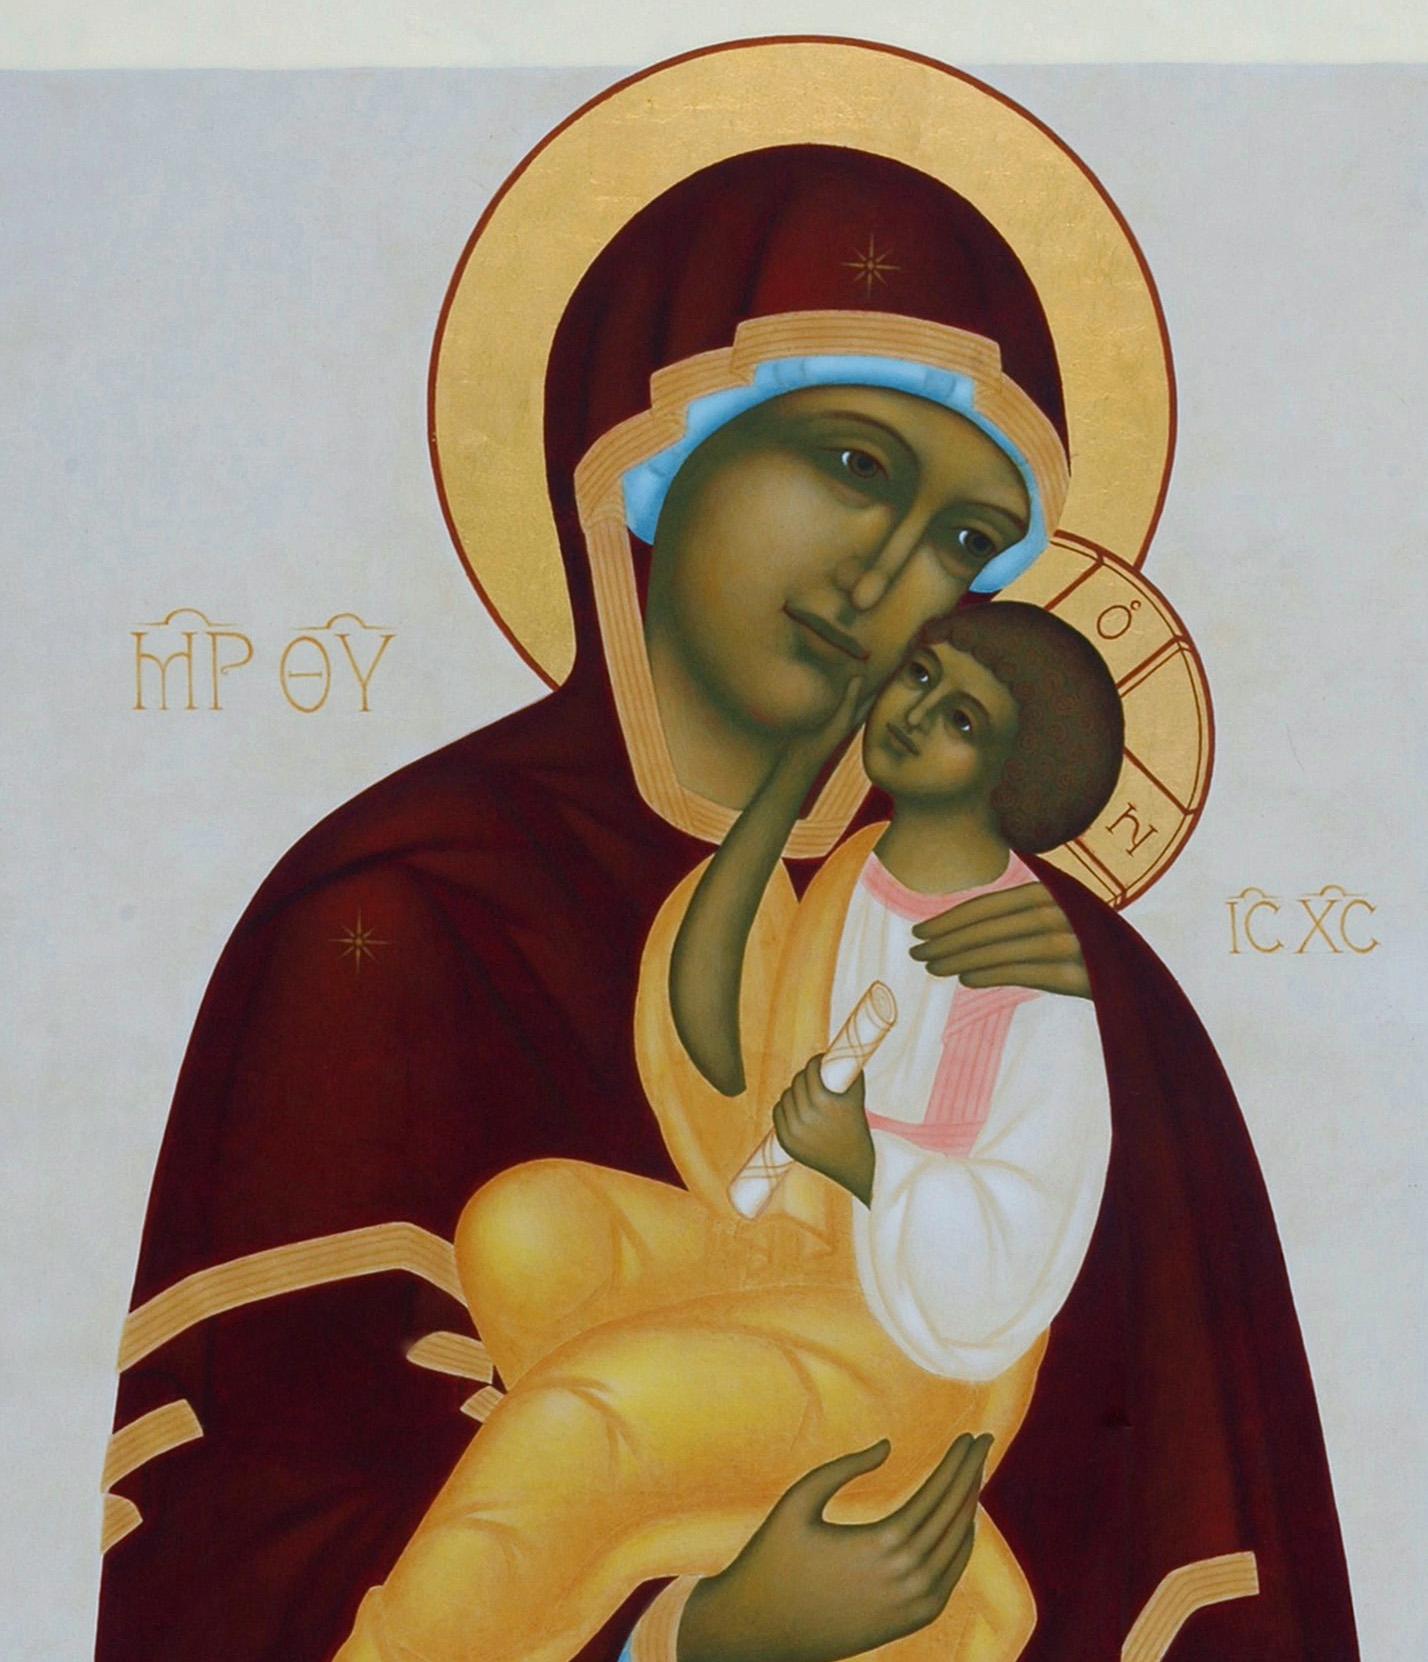 2. Ömhetens Gudsmoder. 2006. 53,5 x 42 cm. Foto Bo Wiberg kopia